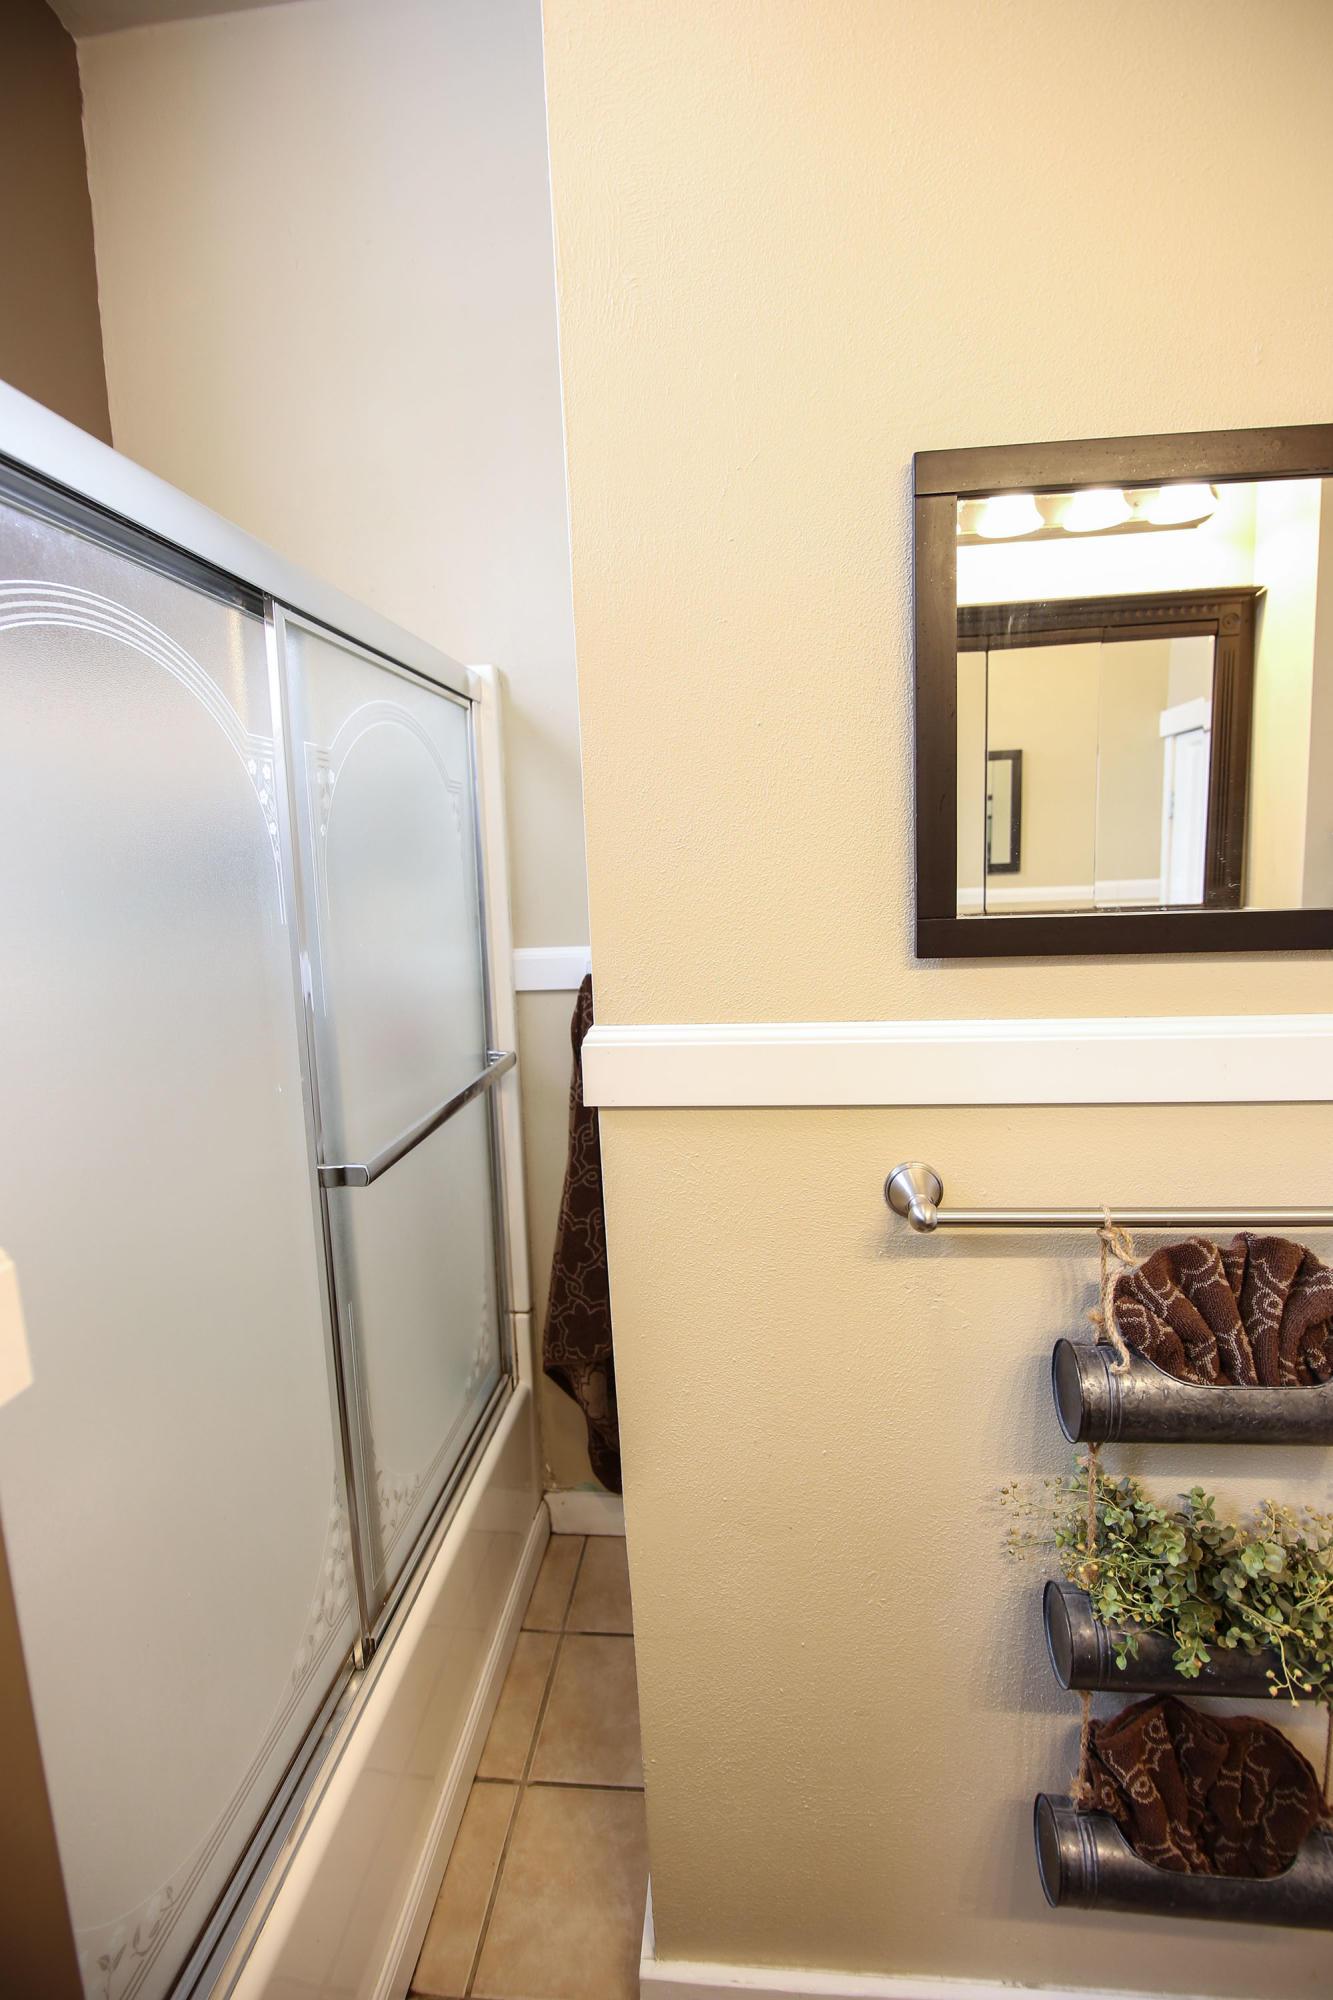 911 11th Street, Sheridan, Wyoming 82801, 4 Bedrooms Bedrooms, ,1.5 BathroomsBathrooms,Residential,For Sale,11th,19-42